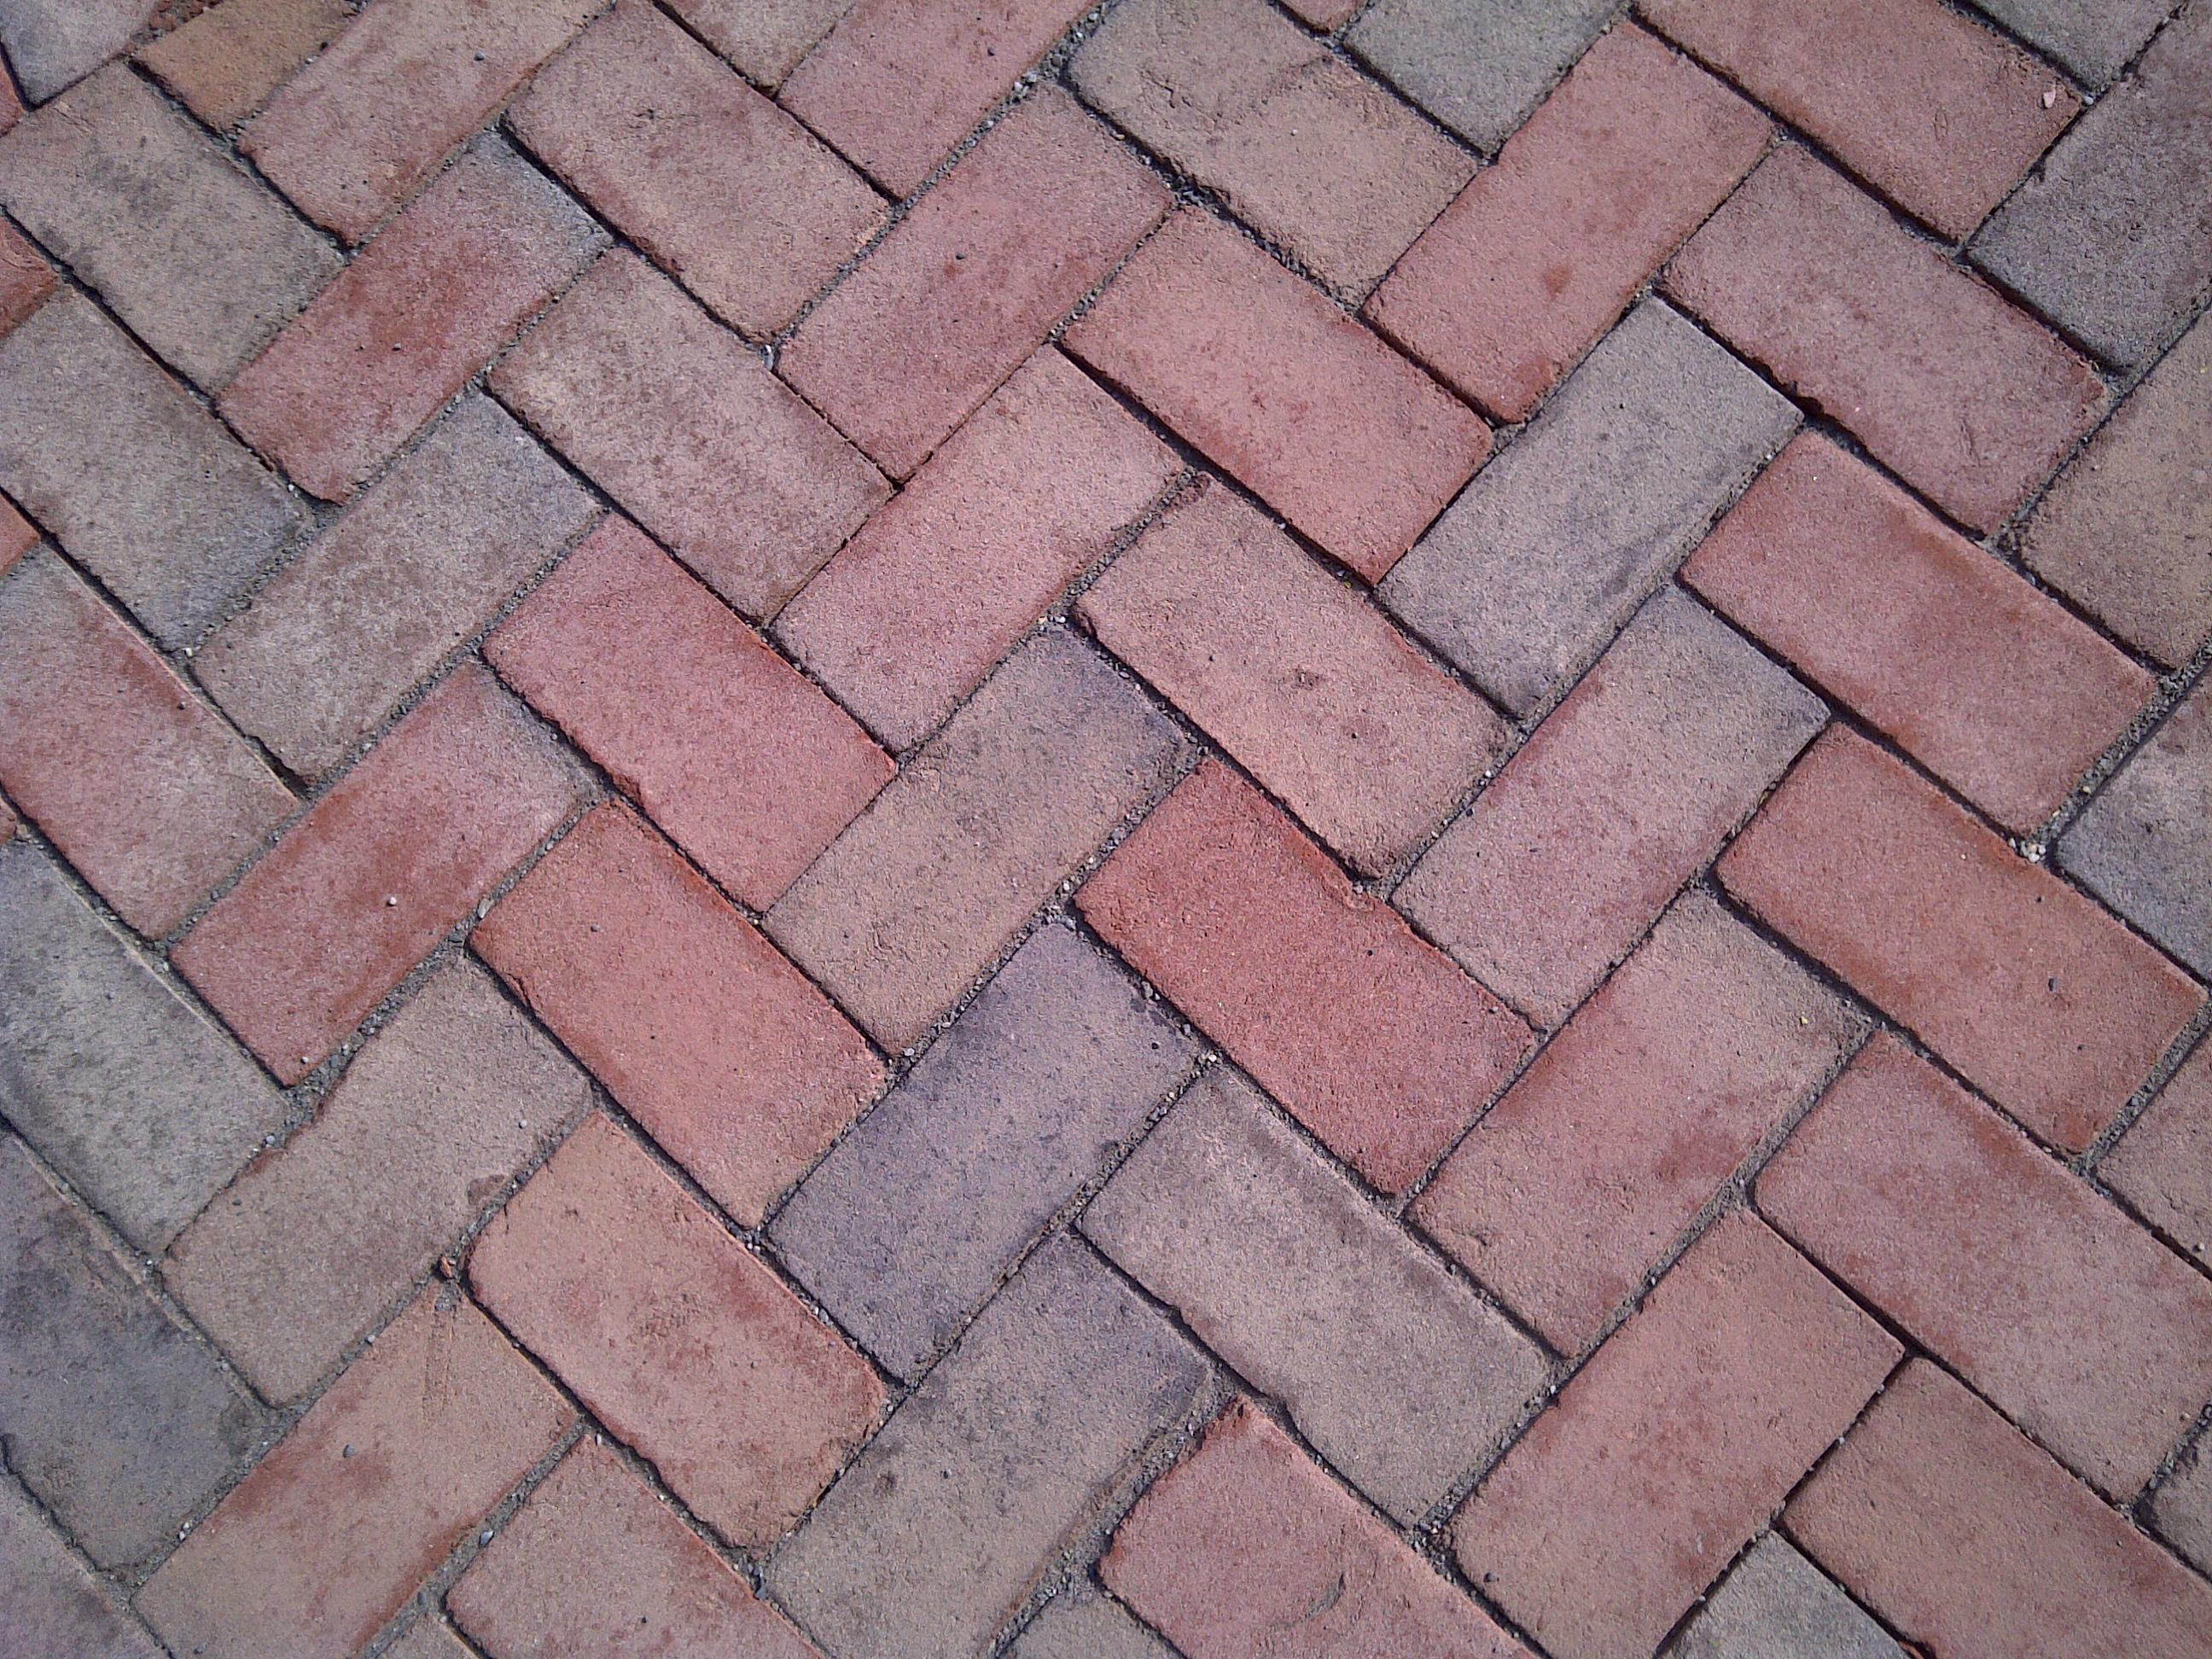 New 50 brick paver patterns inspiration design of best 25 for Brick designs